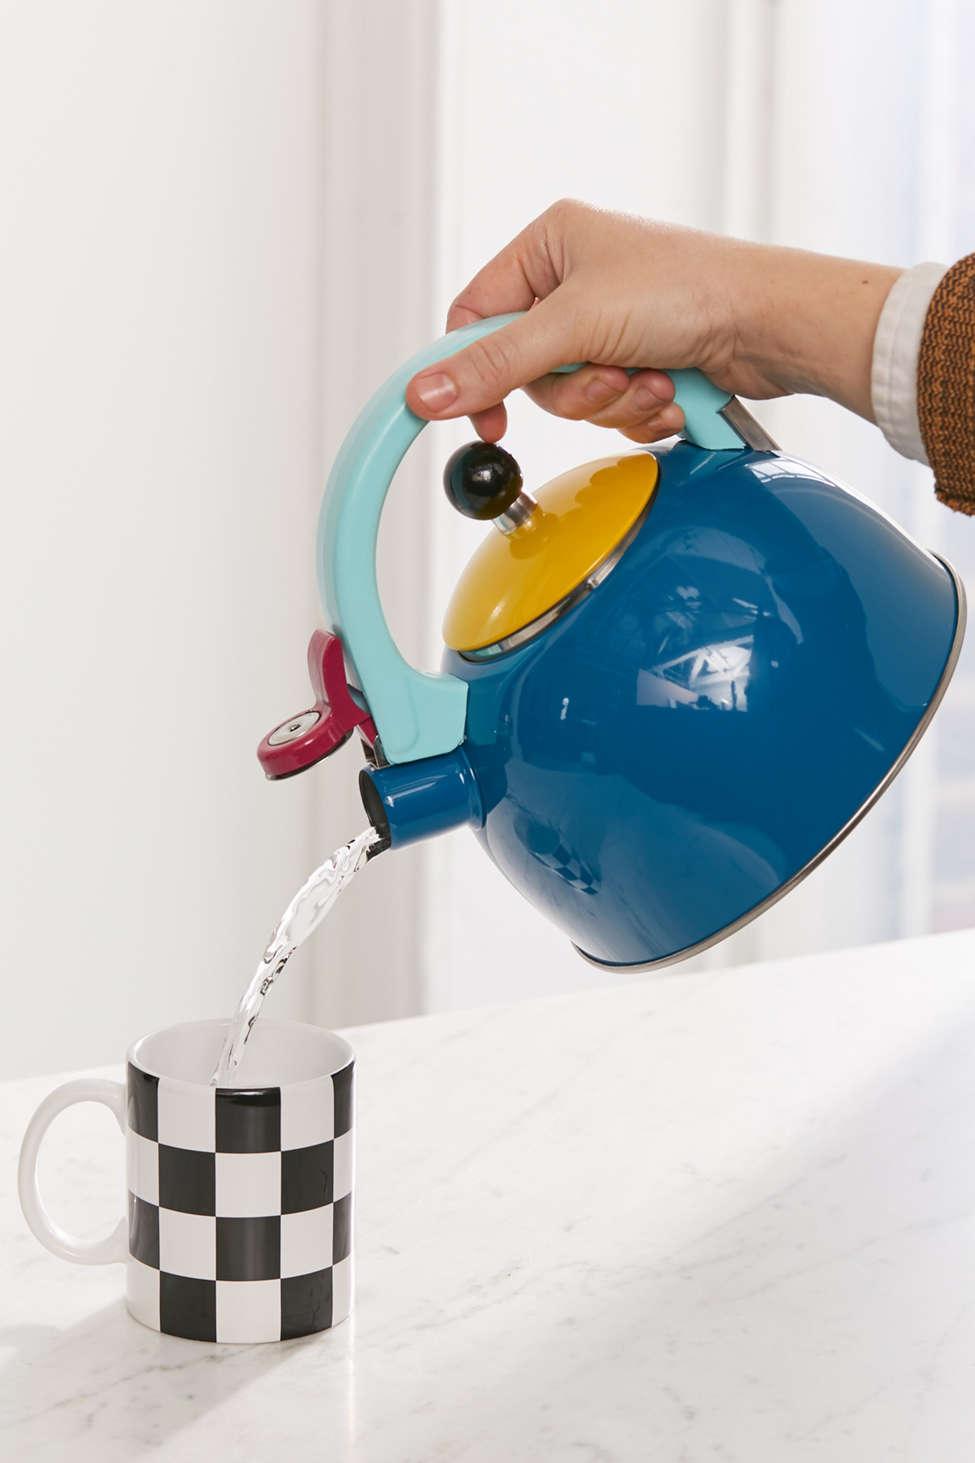 Slide View: 1: Colorblocked Tea Kettle